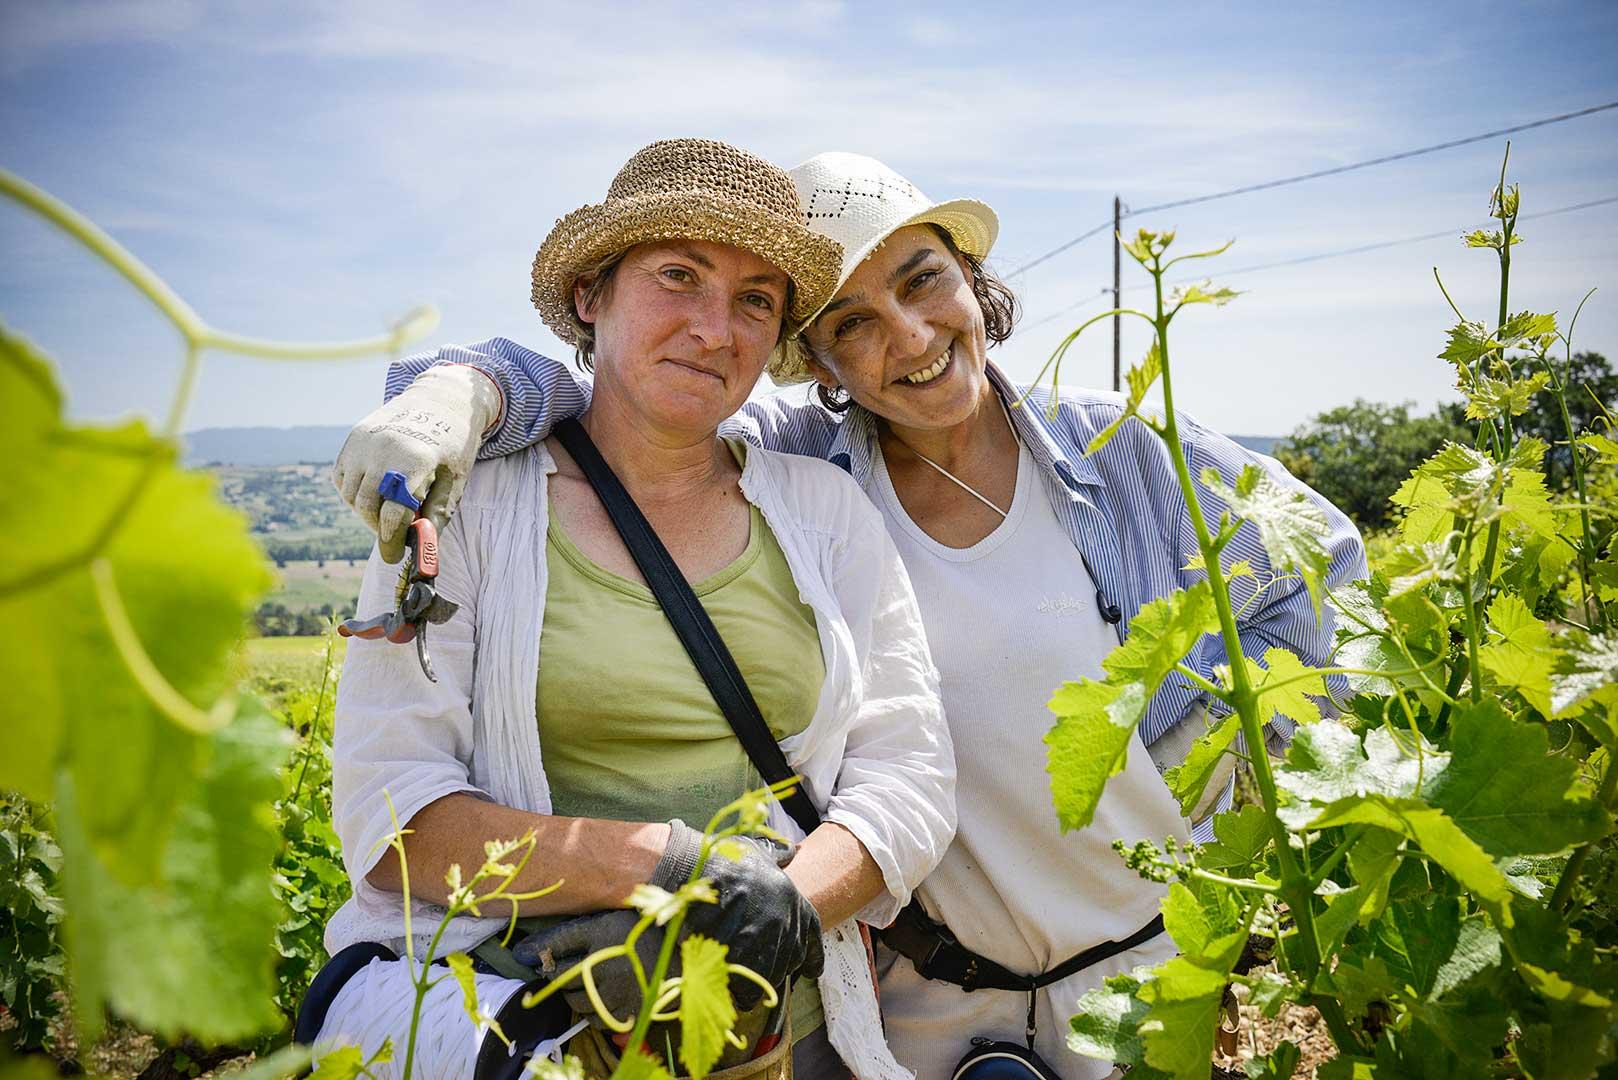 travail de la vigne, vendage en vert, égrappage, Vinsobres, photo Emmanuel Perrin